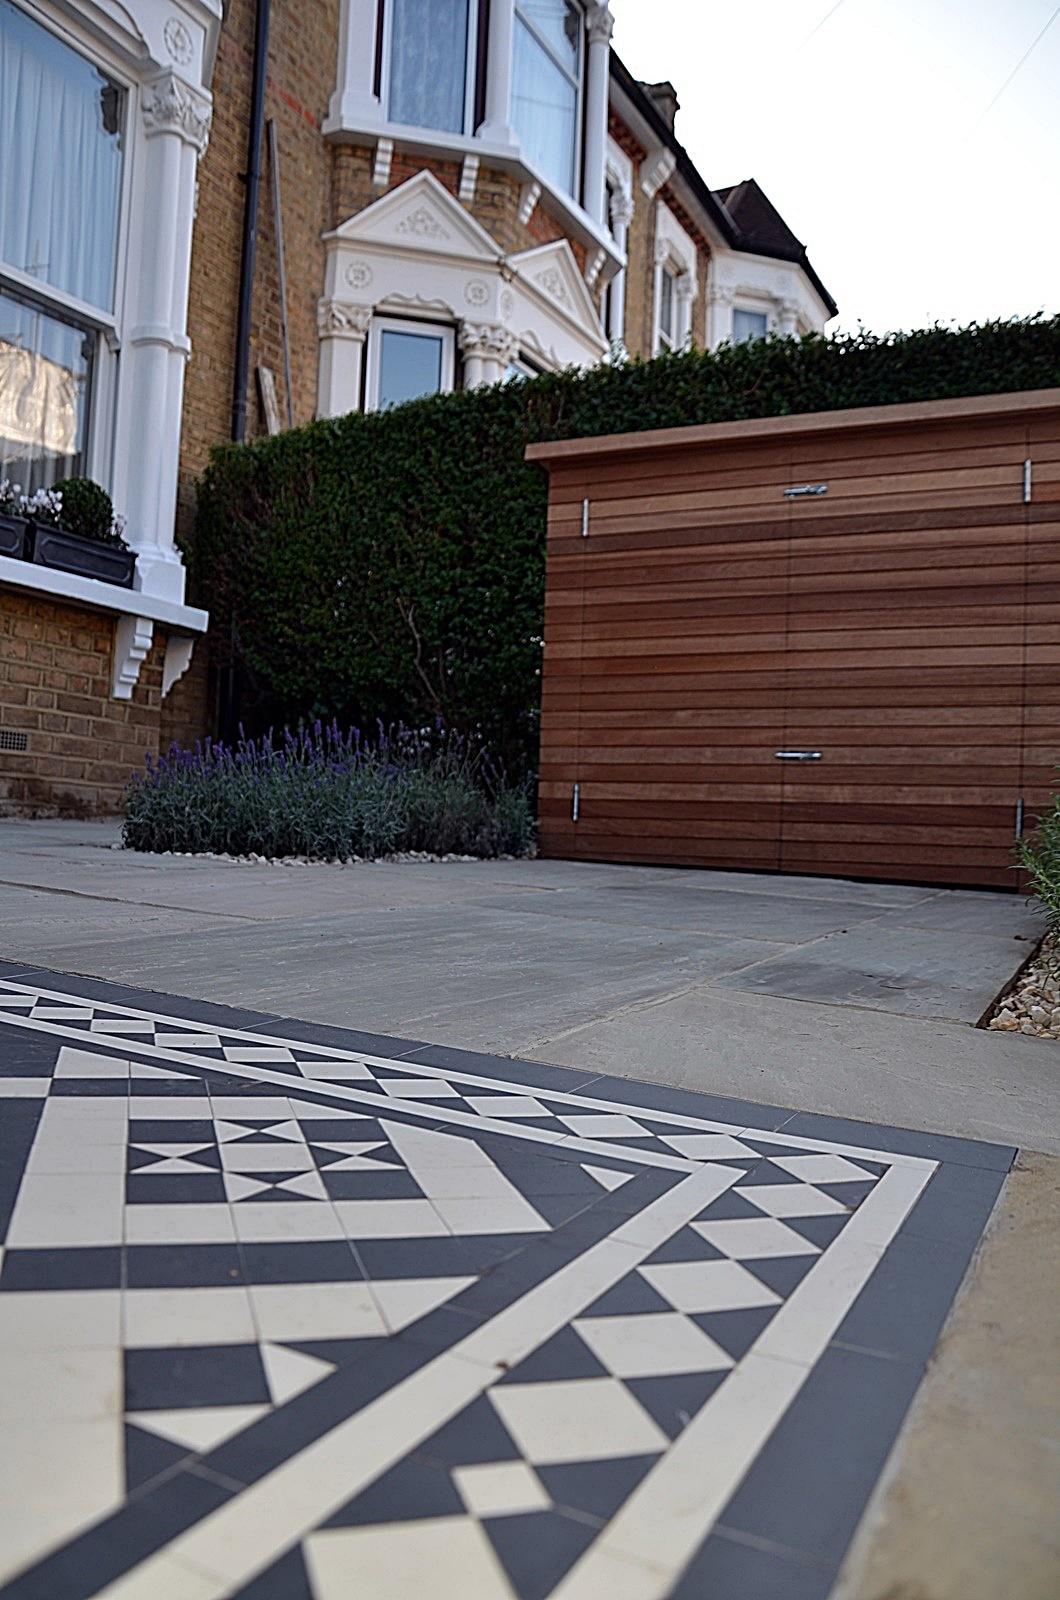 victorian-mosaic-path-paving-bespoke-storage-planting-london-balham-wandsworth-chelsea-fulham